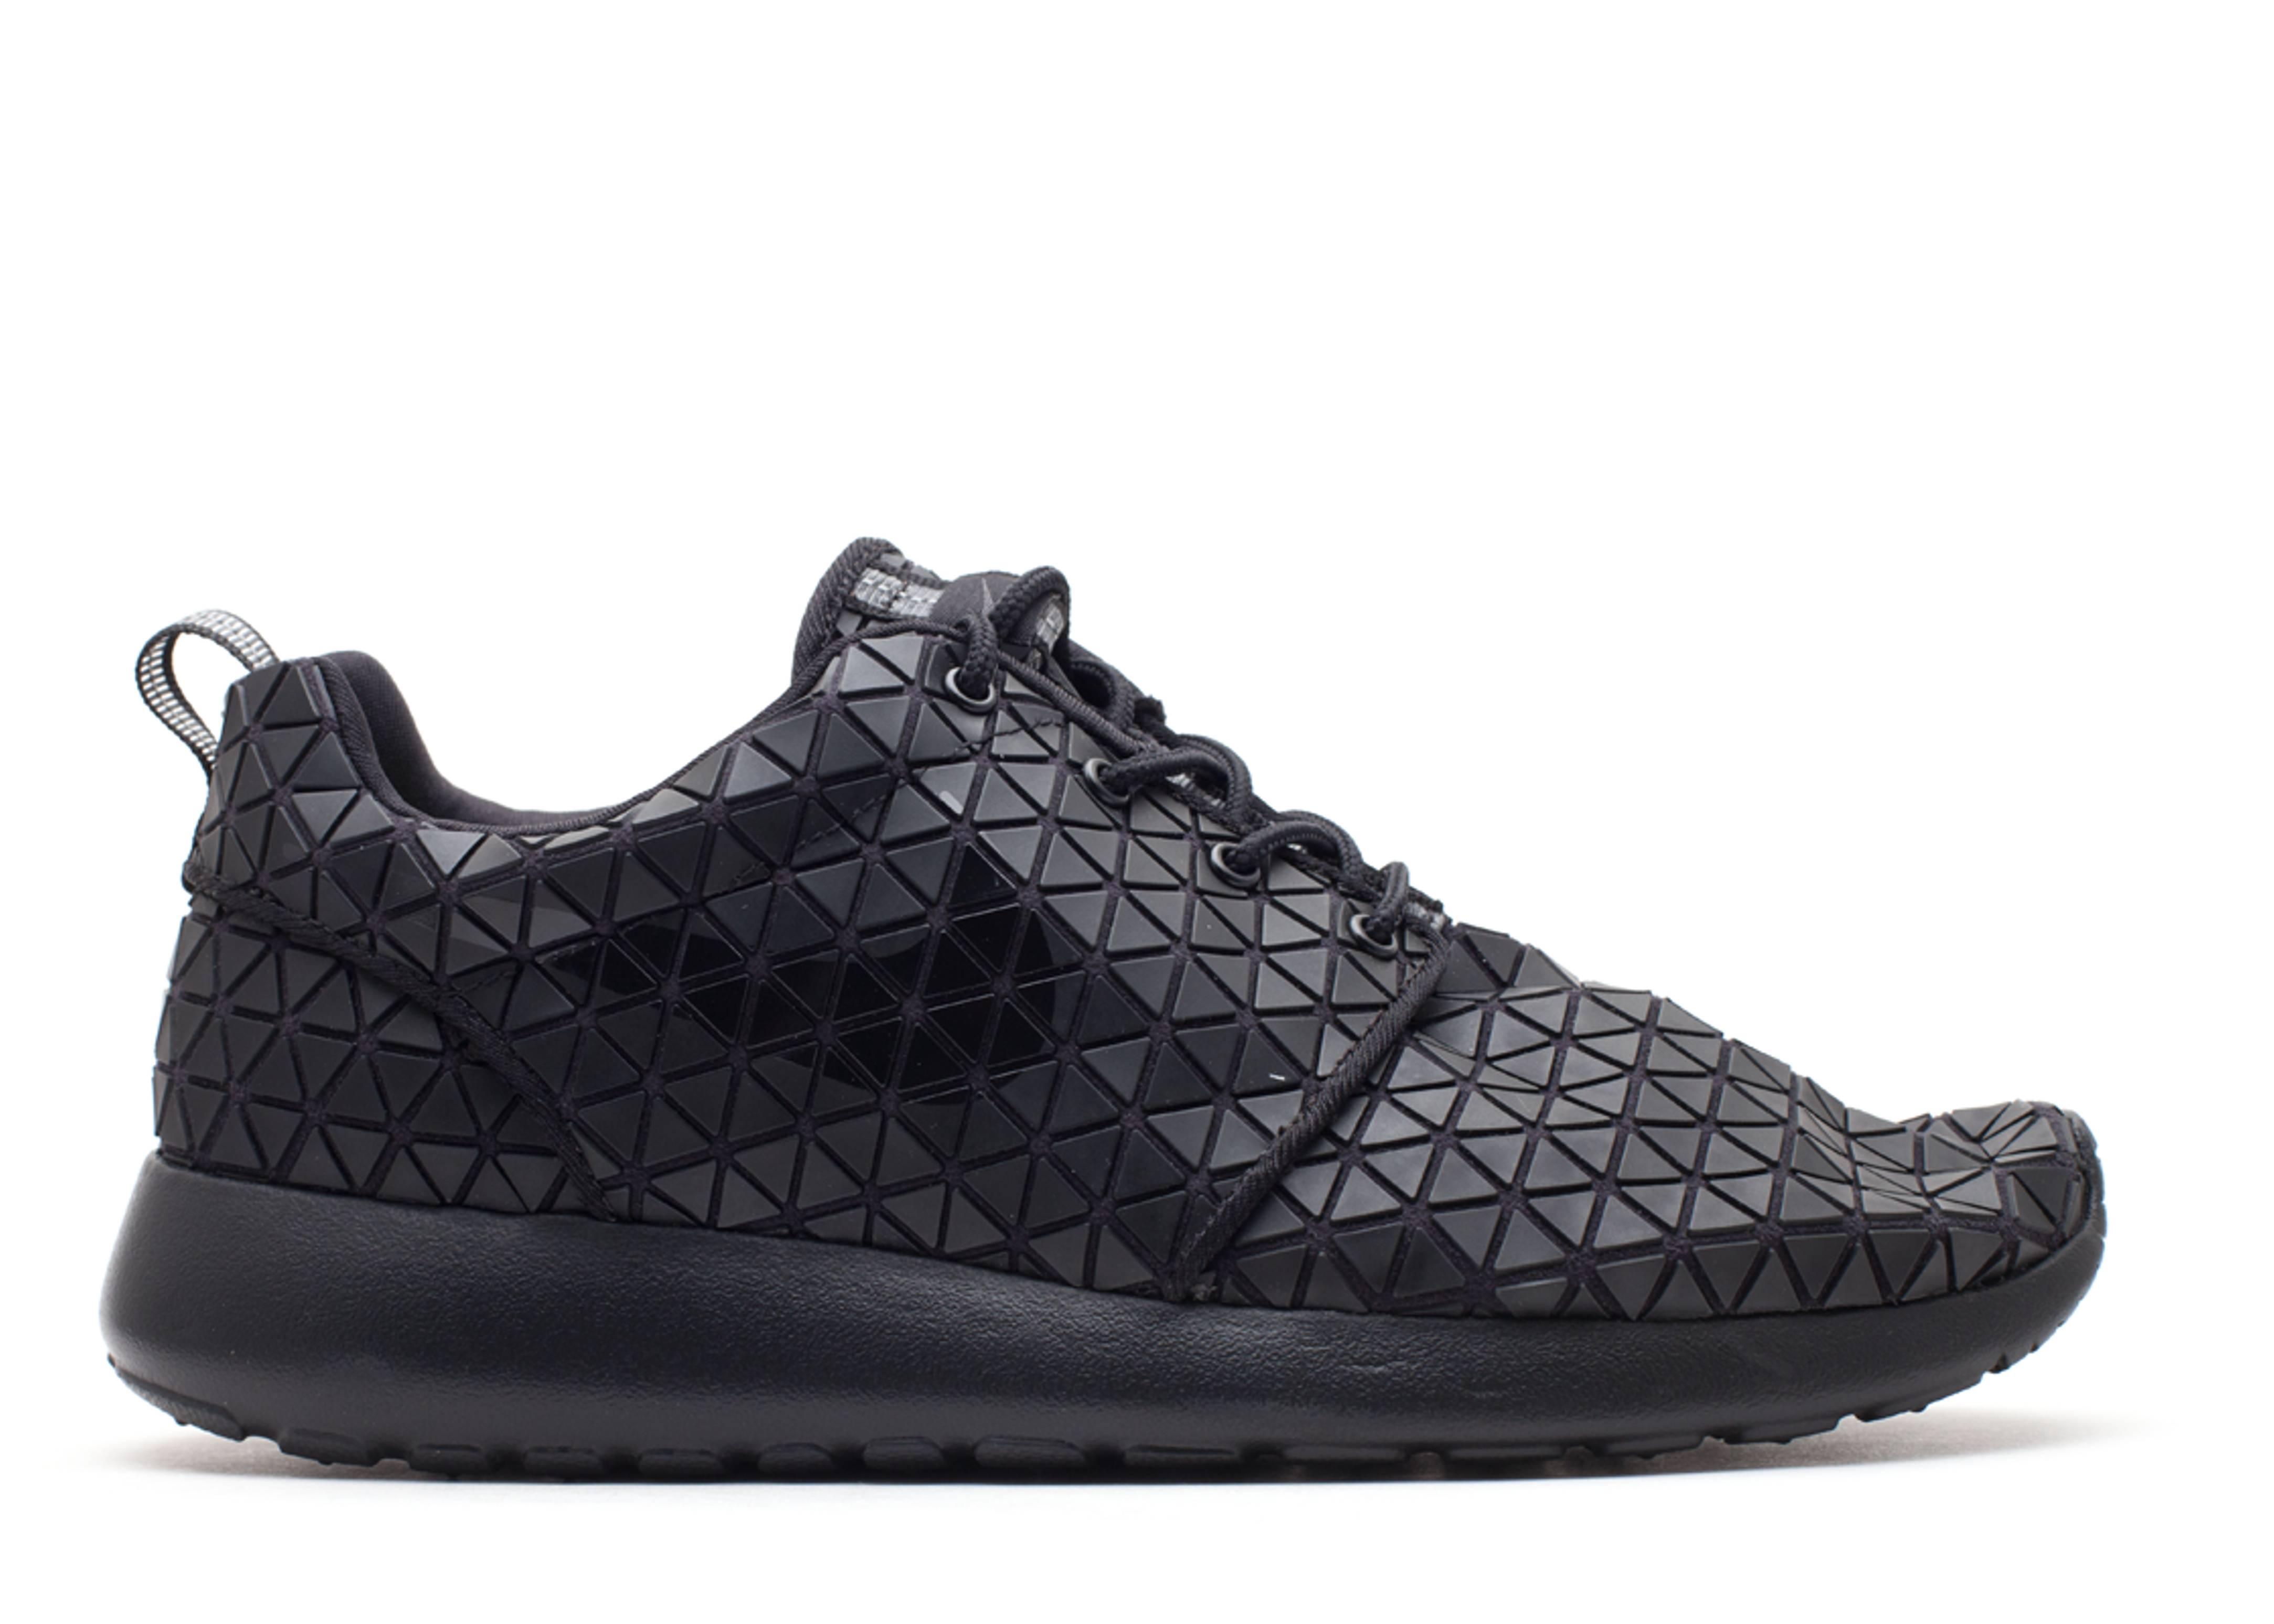 info for 3ca58 e6650 W s Roshe Run Metric Qs - Nike - 607284 001 - black black-black   Flight  Club